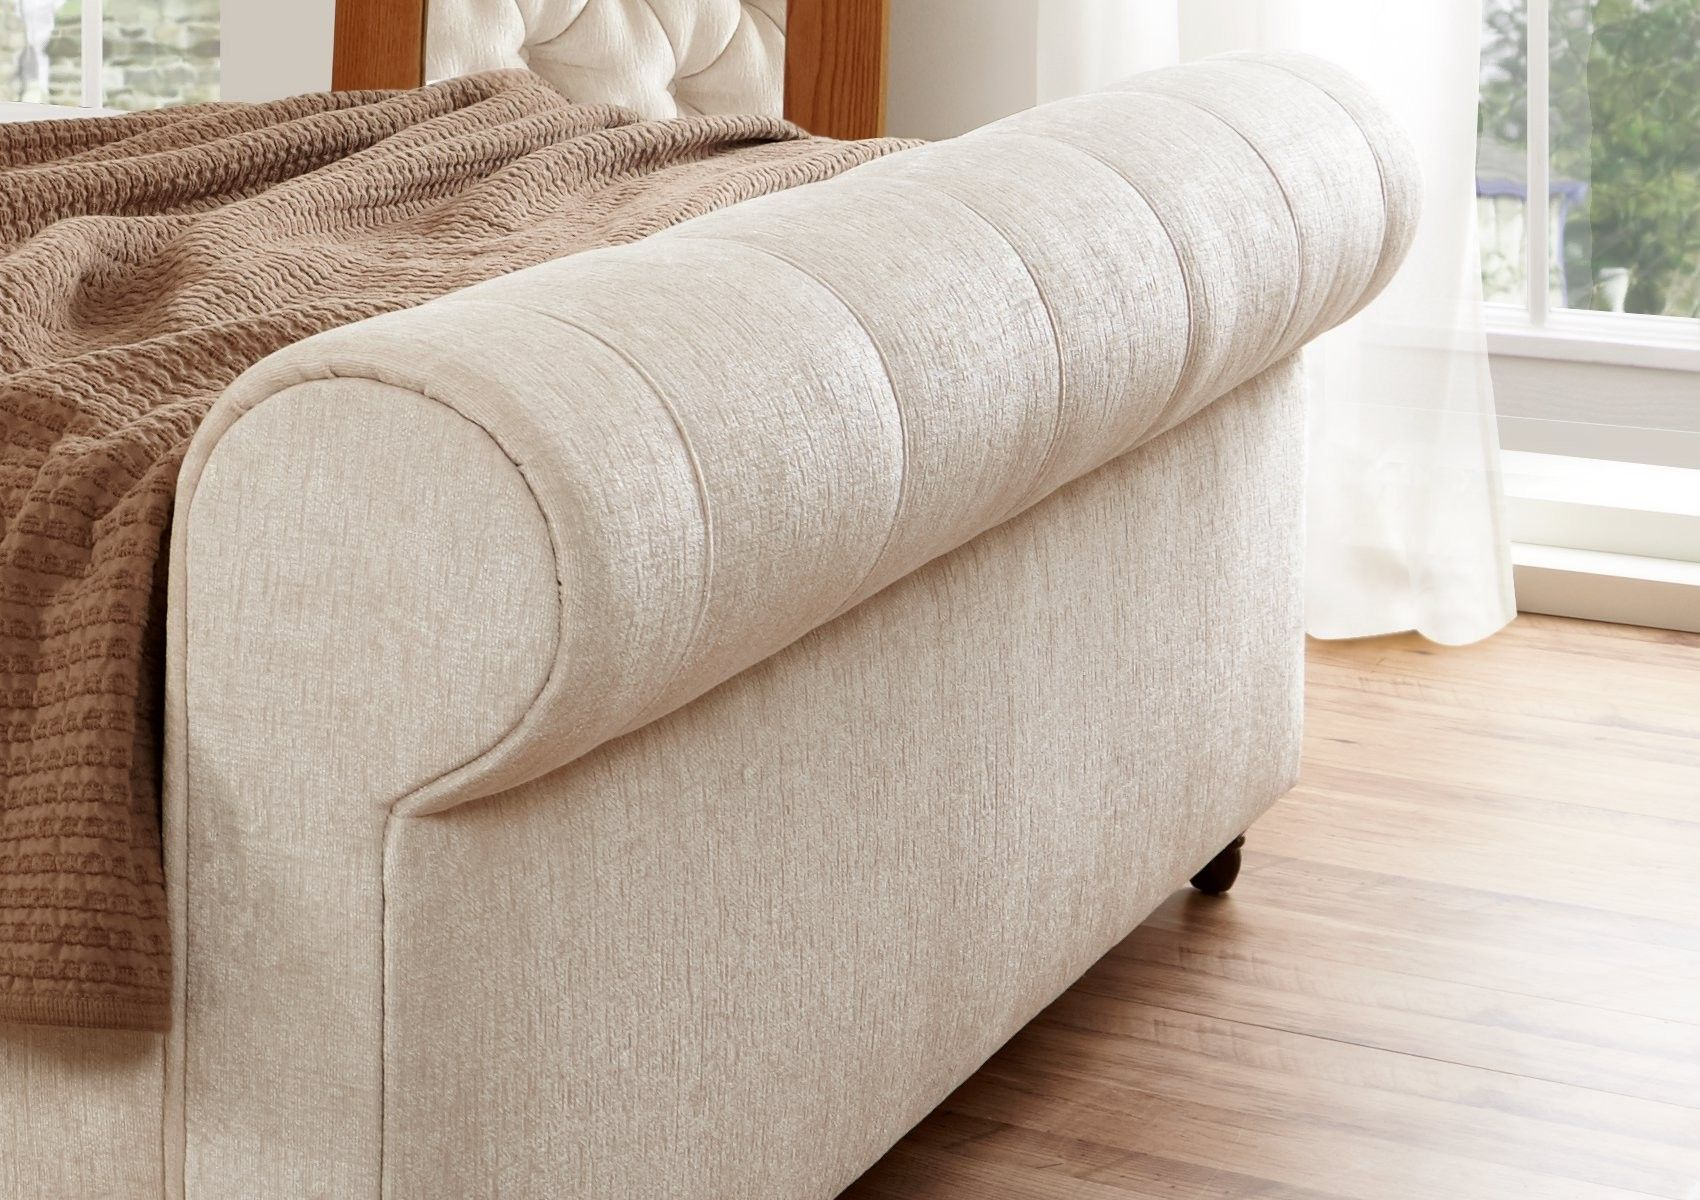 upholstered leather sleigh bed. Elegance Upholstered Sleigh Bed Leather